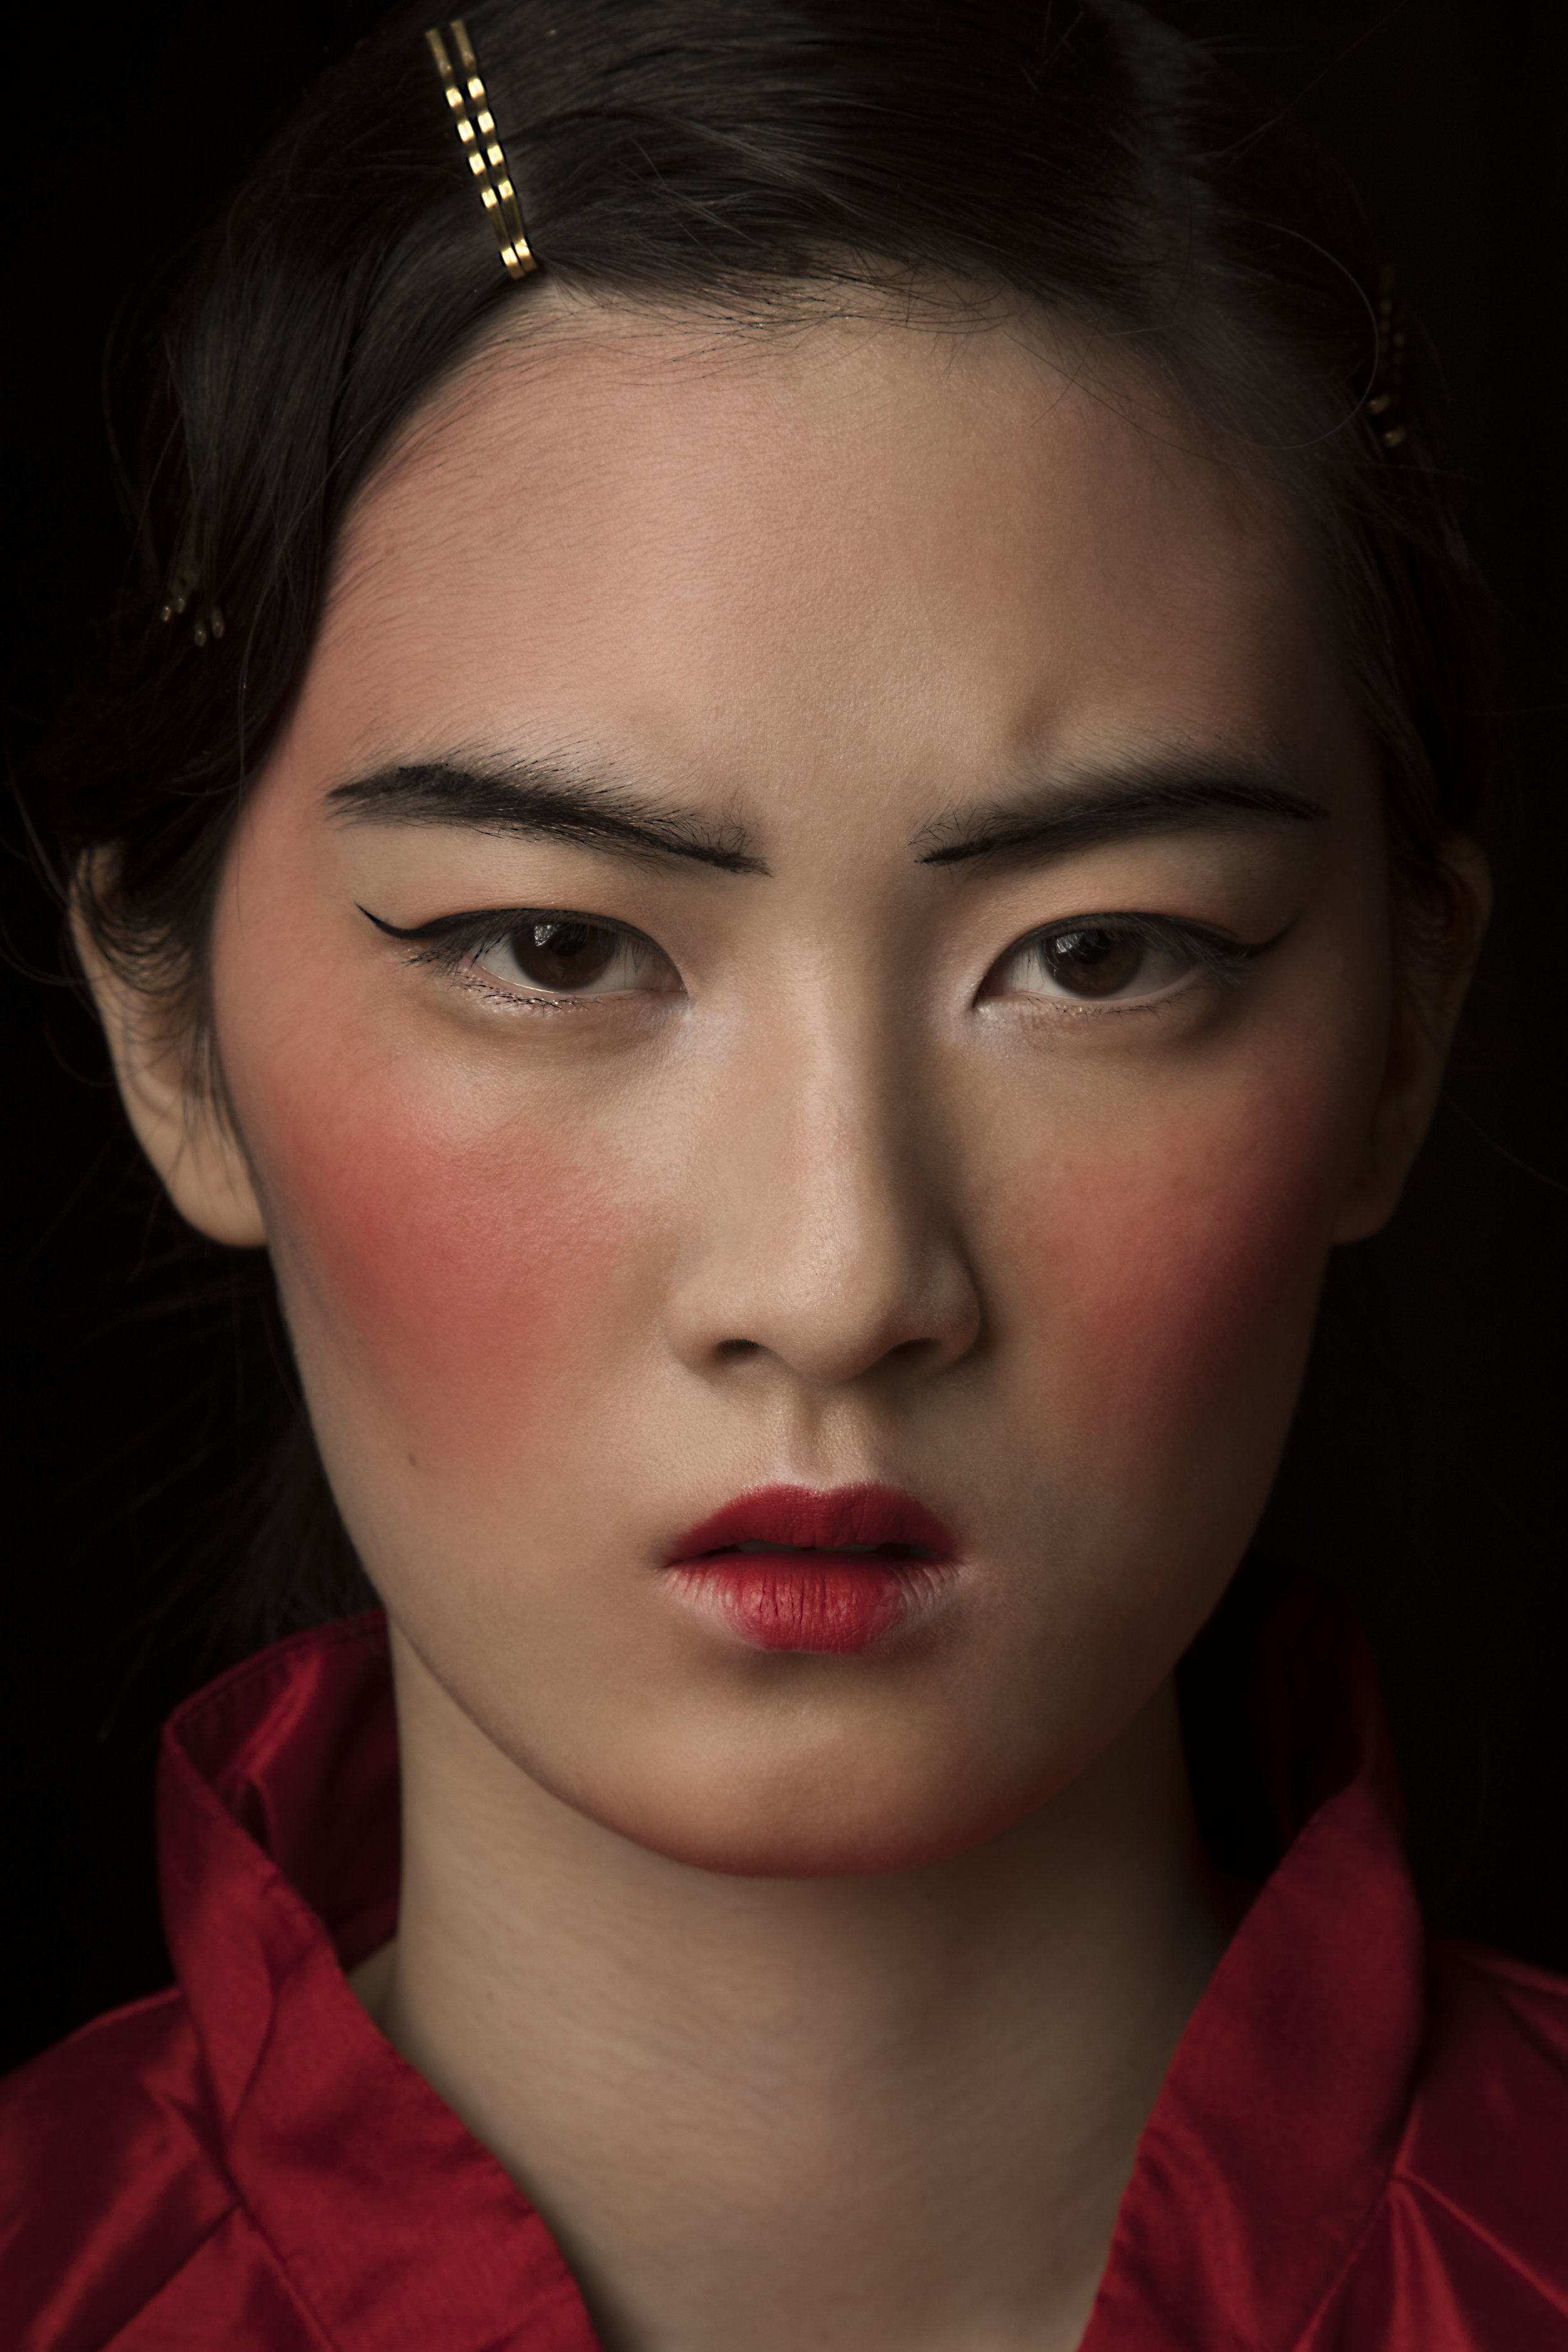 Makeup Artist - Natallie Tse